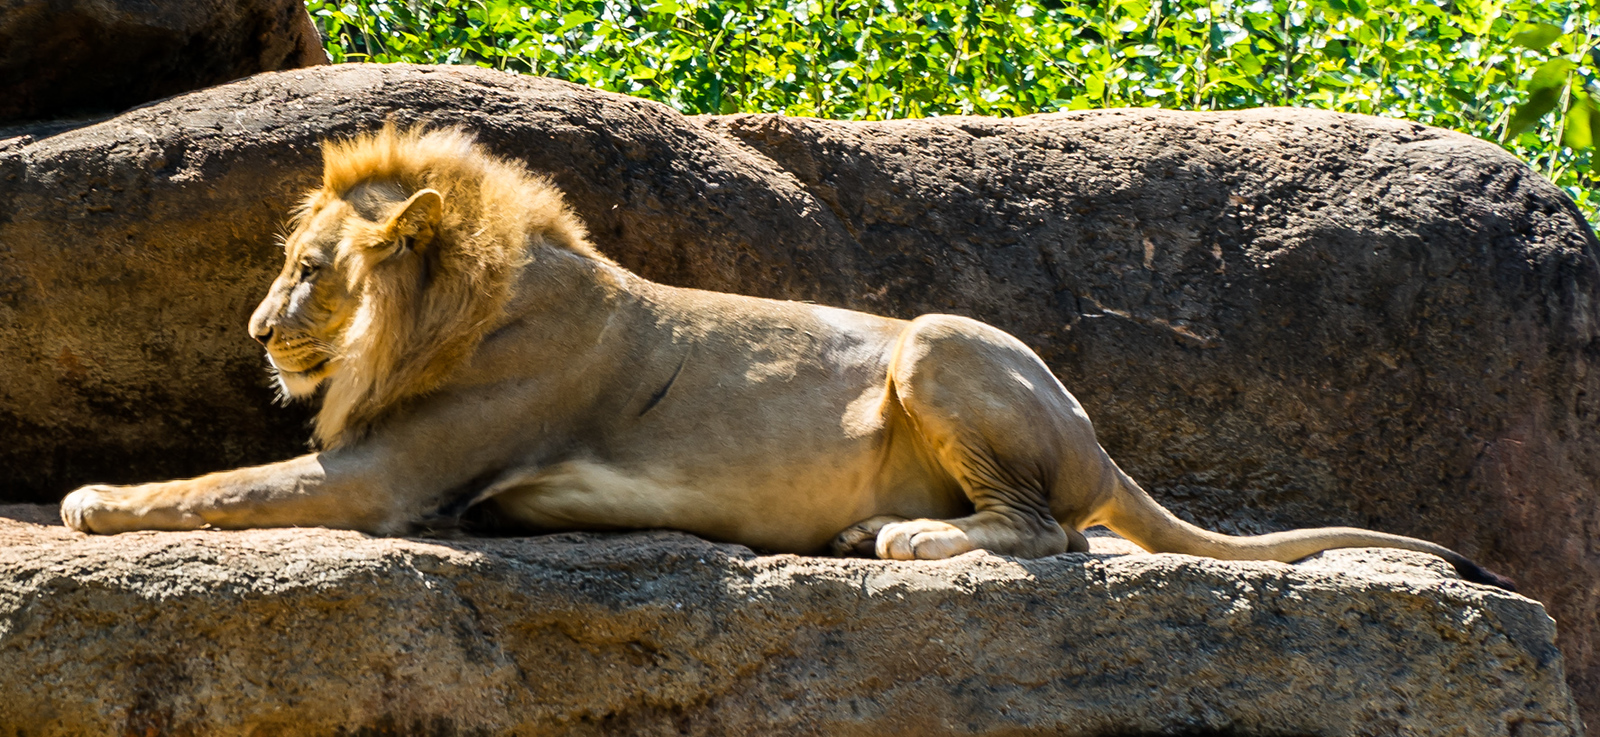 Zoo Atlanta.  Lion, playing Sphinx.